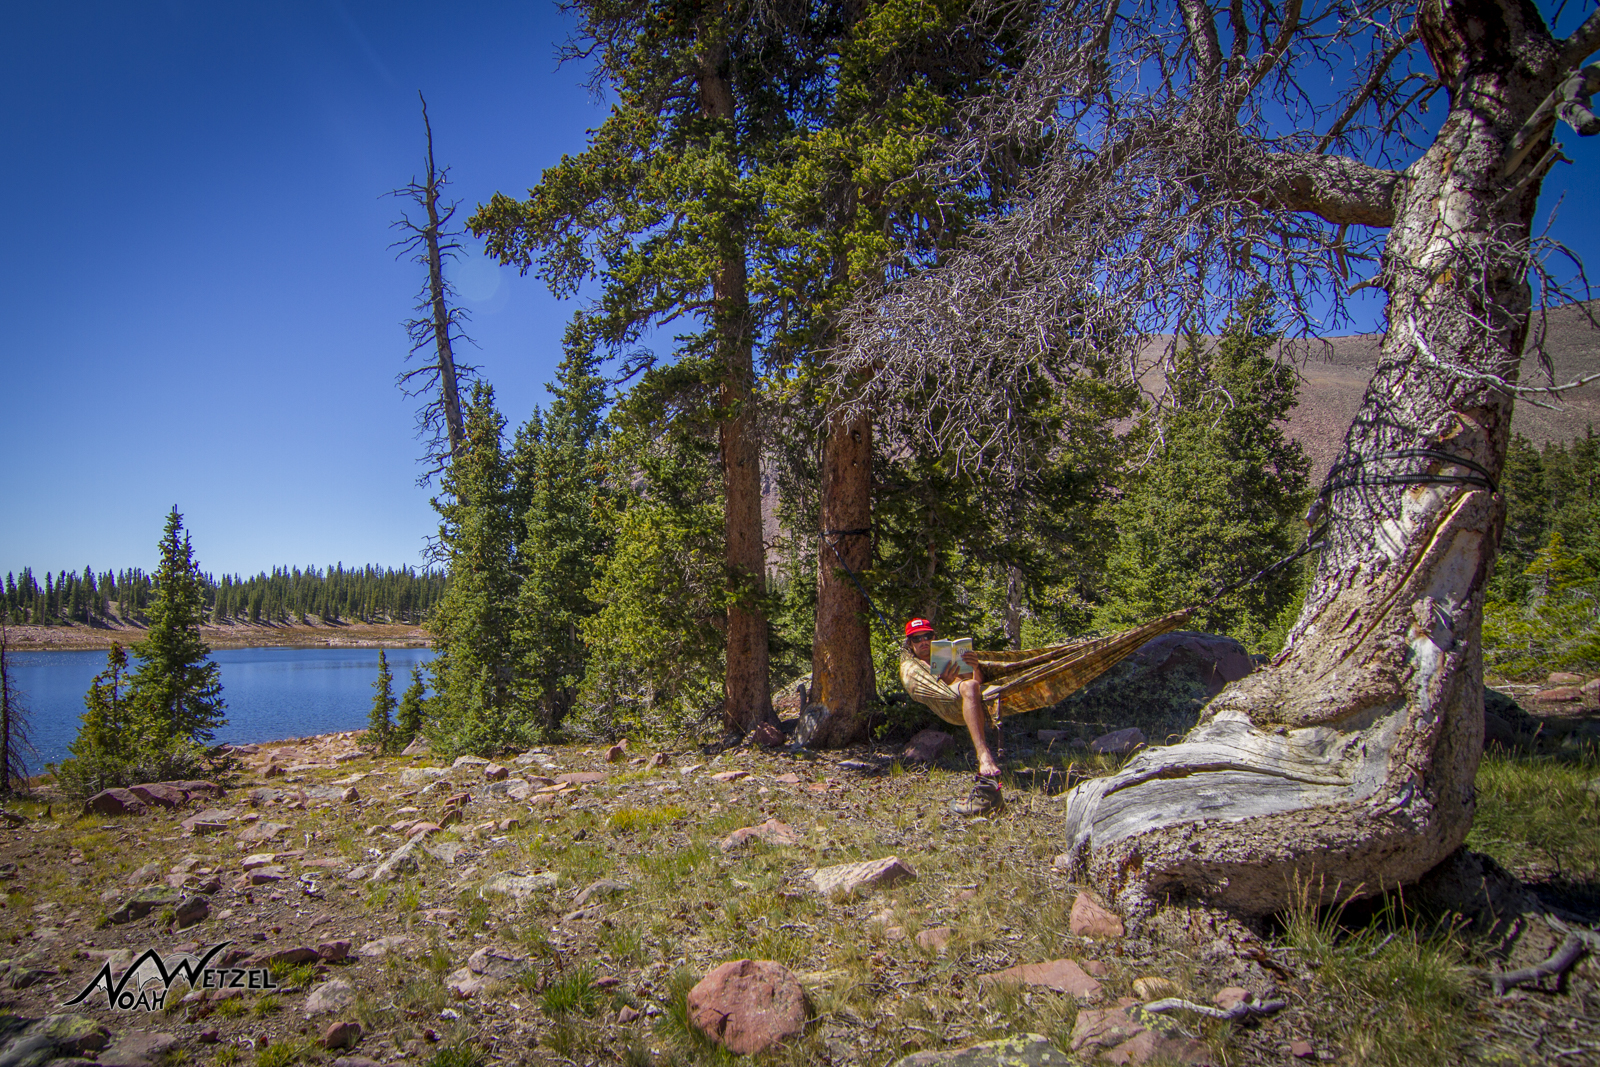 East Timothy Lake. High Uintas Wilderness, Utah